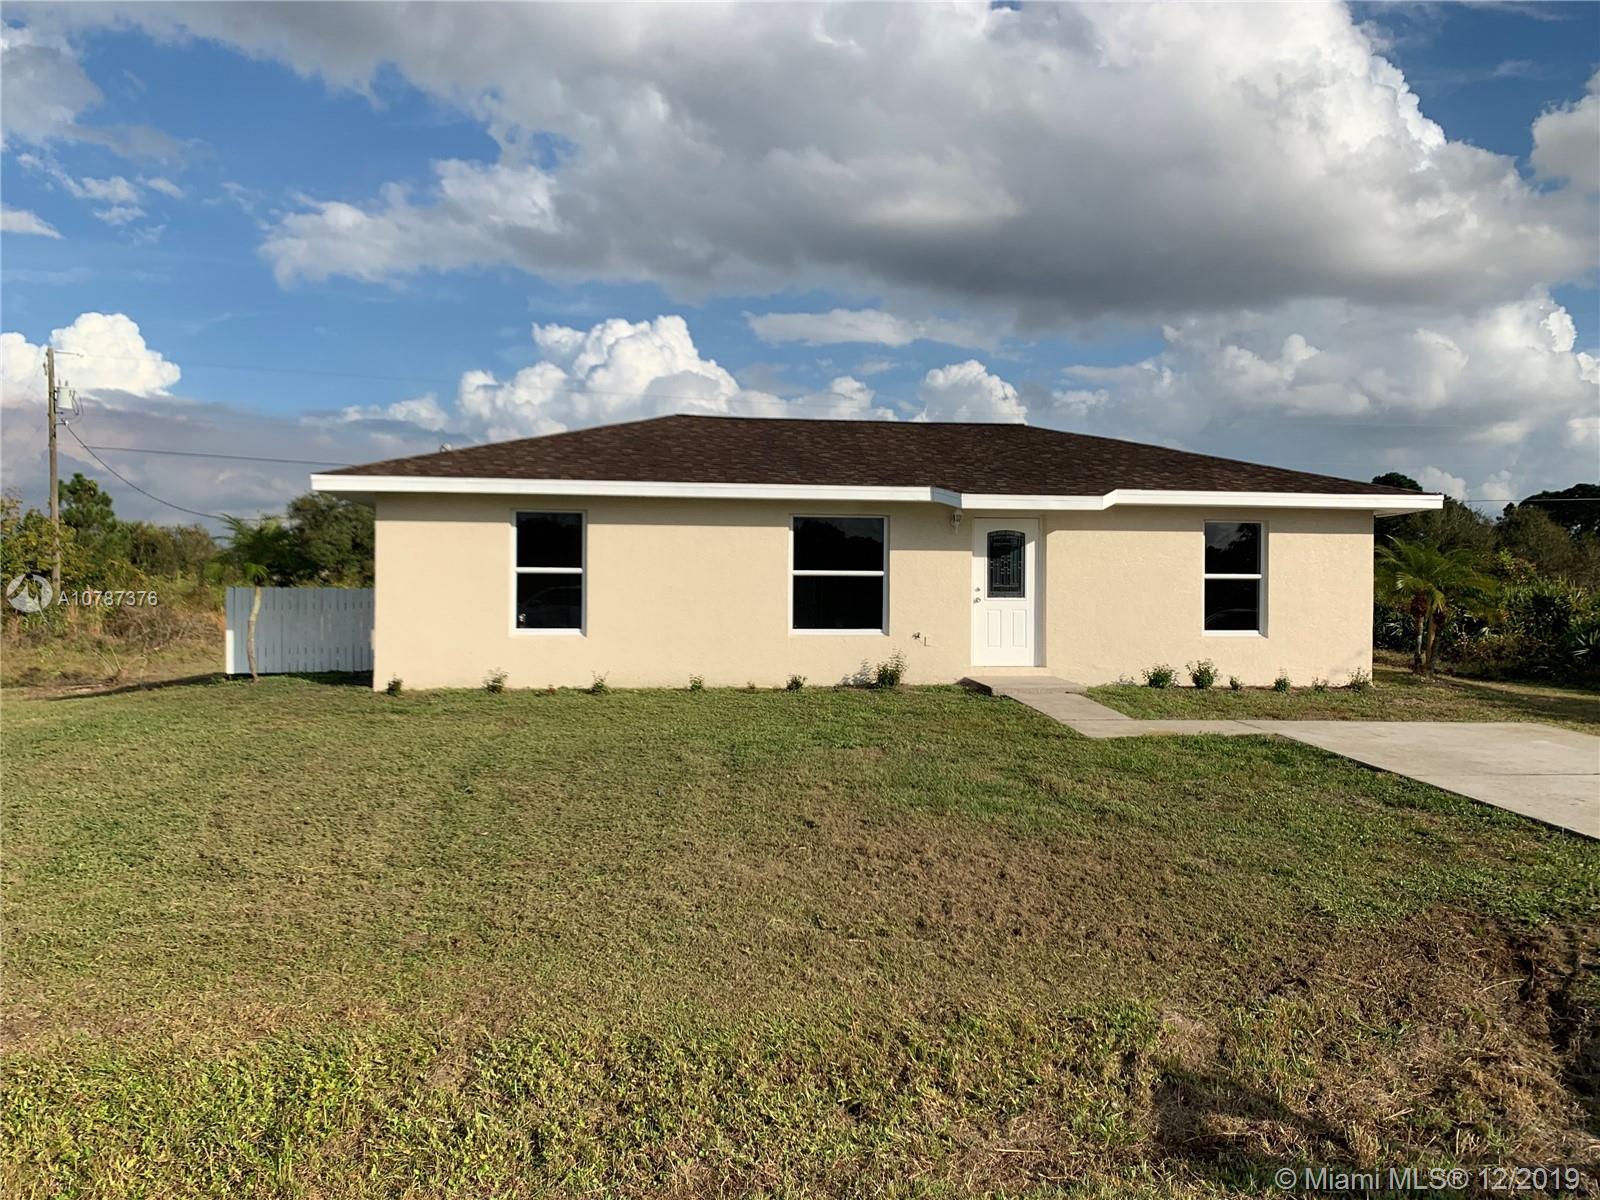 3934 NW 26 AVE, Okeechobee, FL 34972